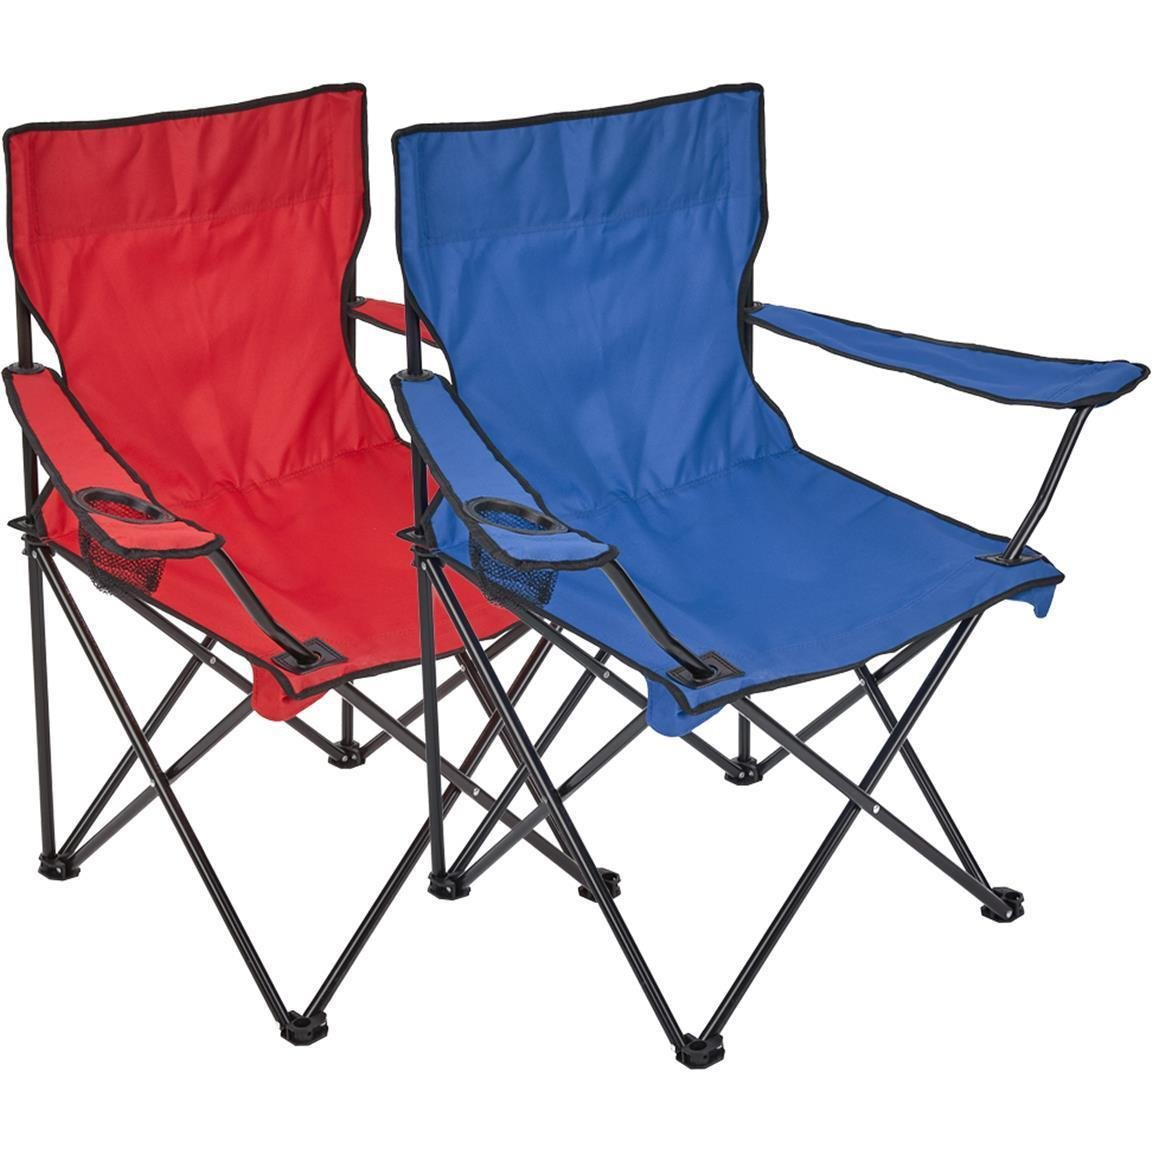 Silla plegable, 2 unidades, silla de camping con soporte para bebidas en reposabrazos, azul / rojo